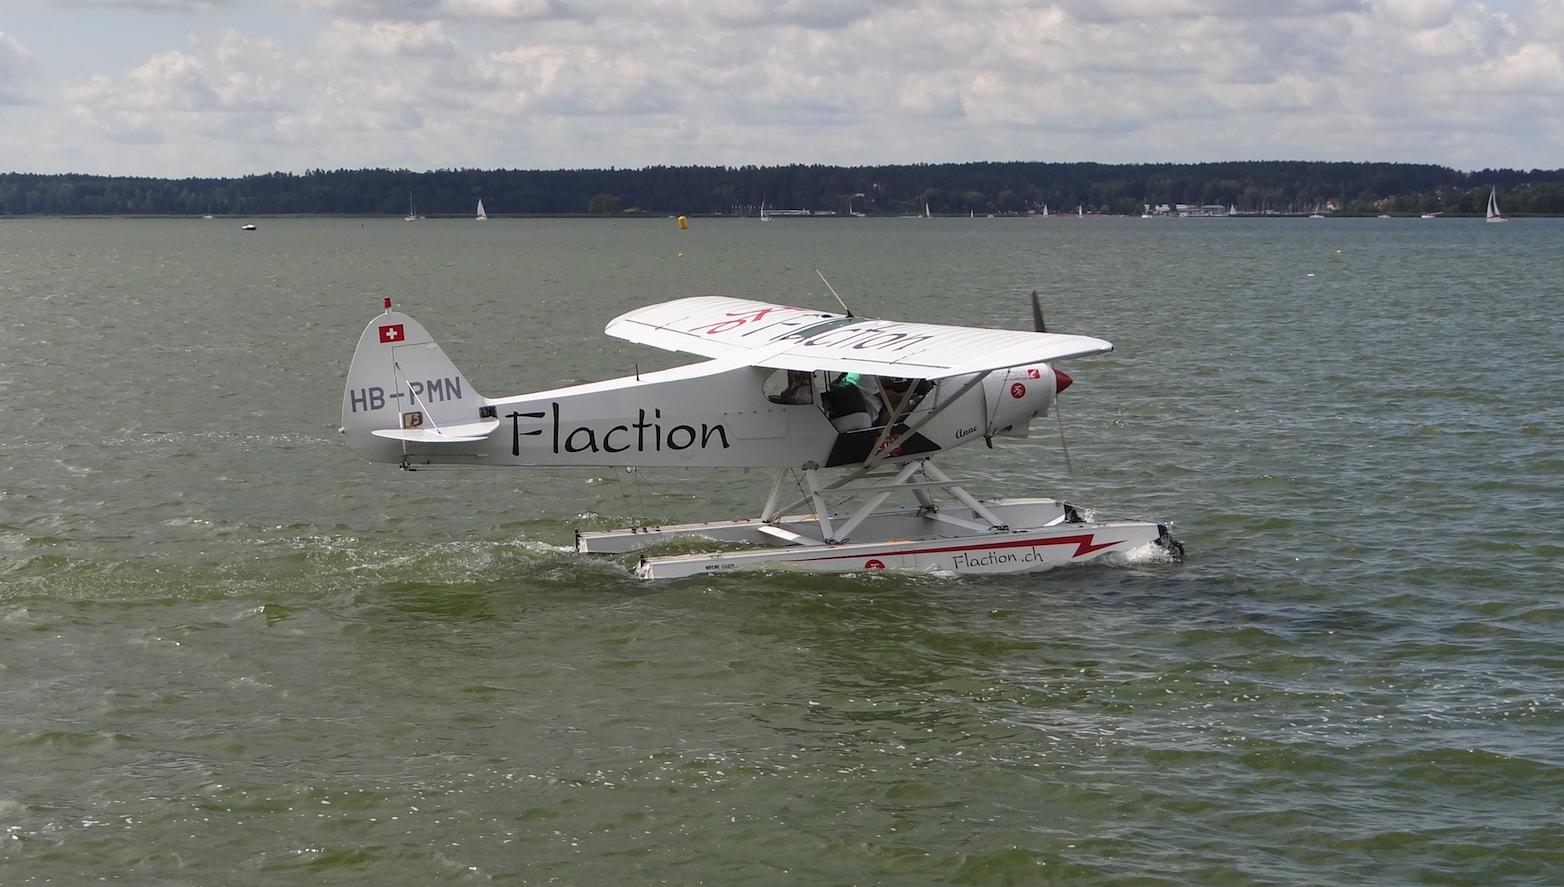 Piper PA-18-150 Super Cub, HB-PMN. 2018 rok. Zdjęcie Karol Placha Hetman